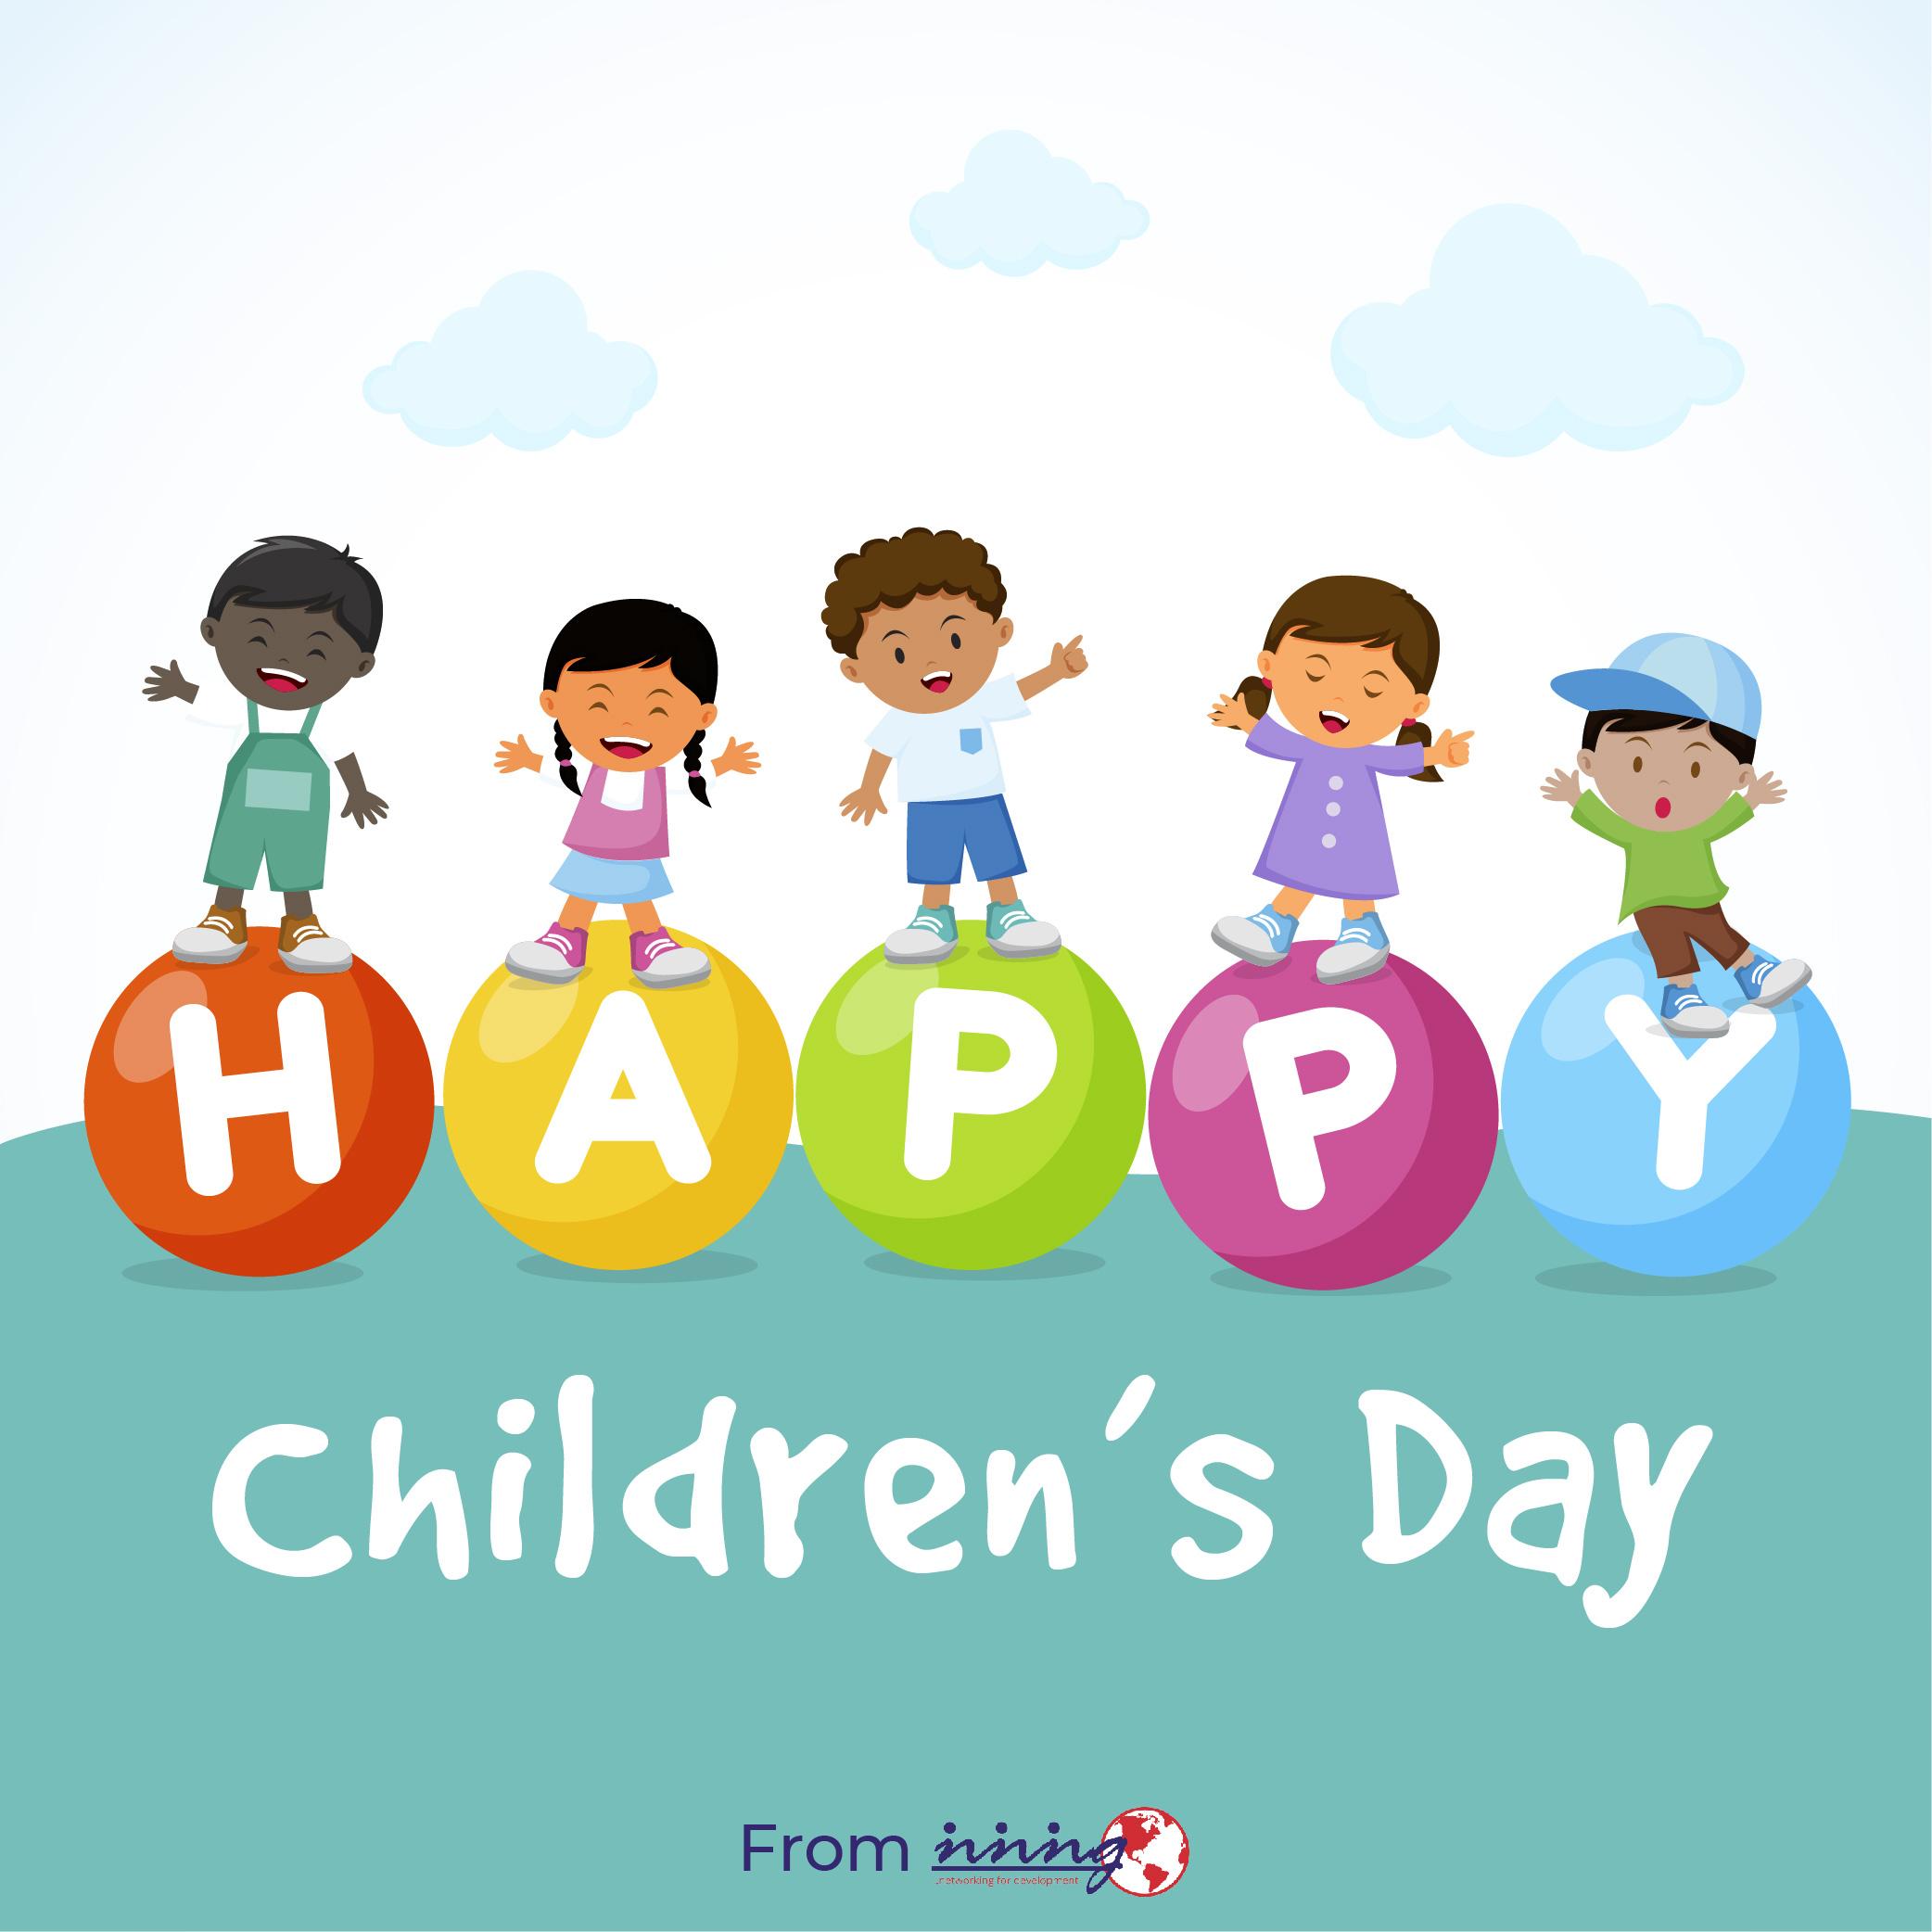 Profiling CRAPI on Children's Day